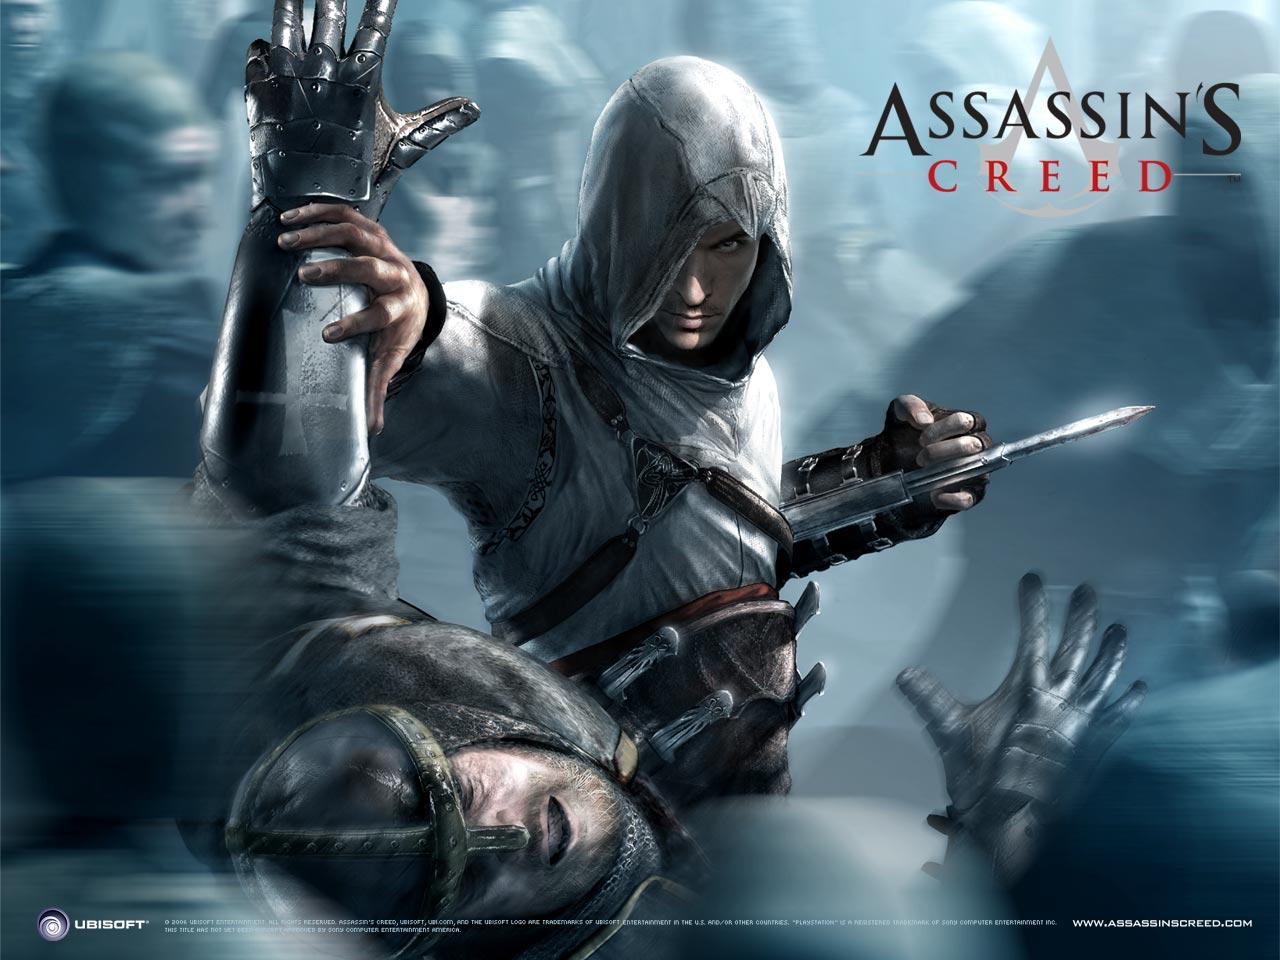 http://4.bp.blogspot.com/_Fgsnb08163s/TSJFqNkD_TI/AAAAAAAAACs/SFe3PCa0uo4/s1600/assassins_creed.jpg